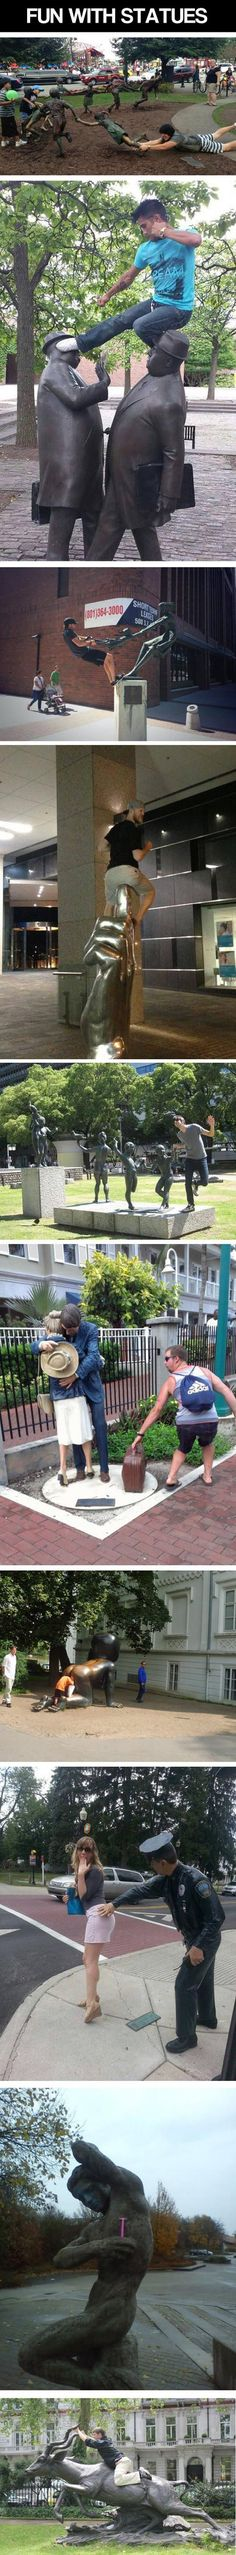 Funny Statues http://ibeebz.com